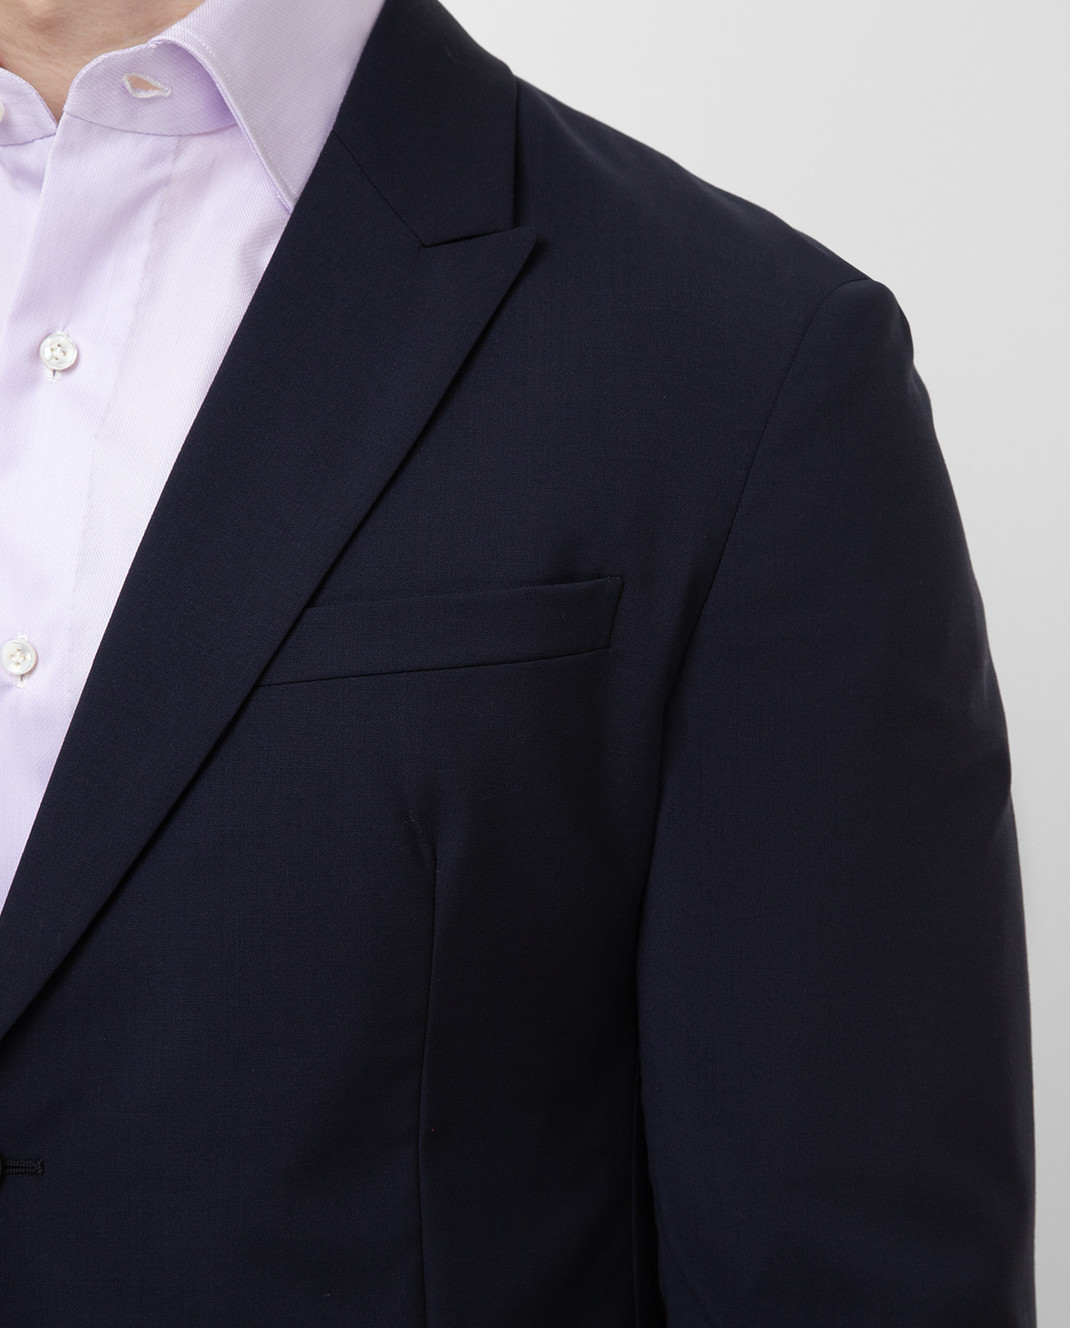 Prada Темно-синий блейзер из шерсти UGS0141RII изображение 5